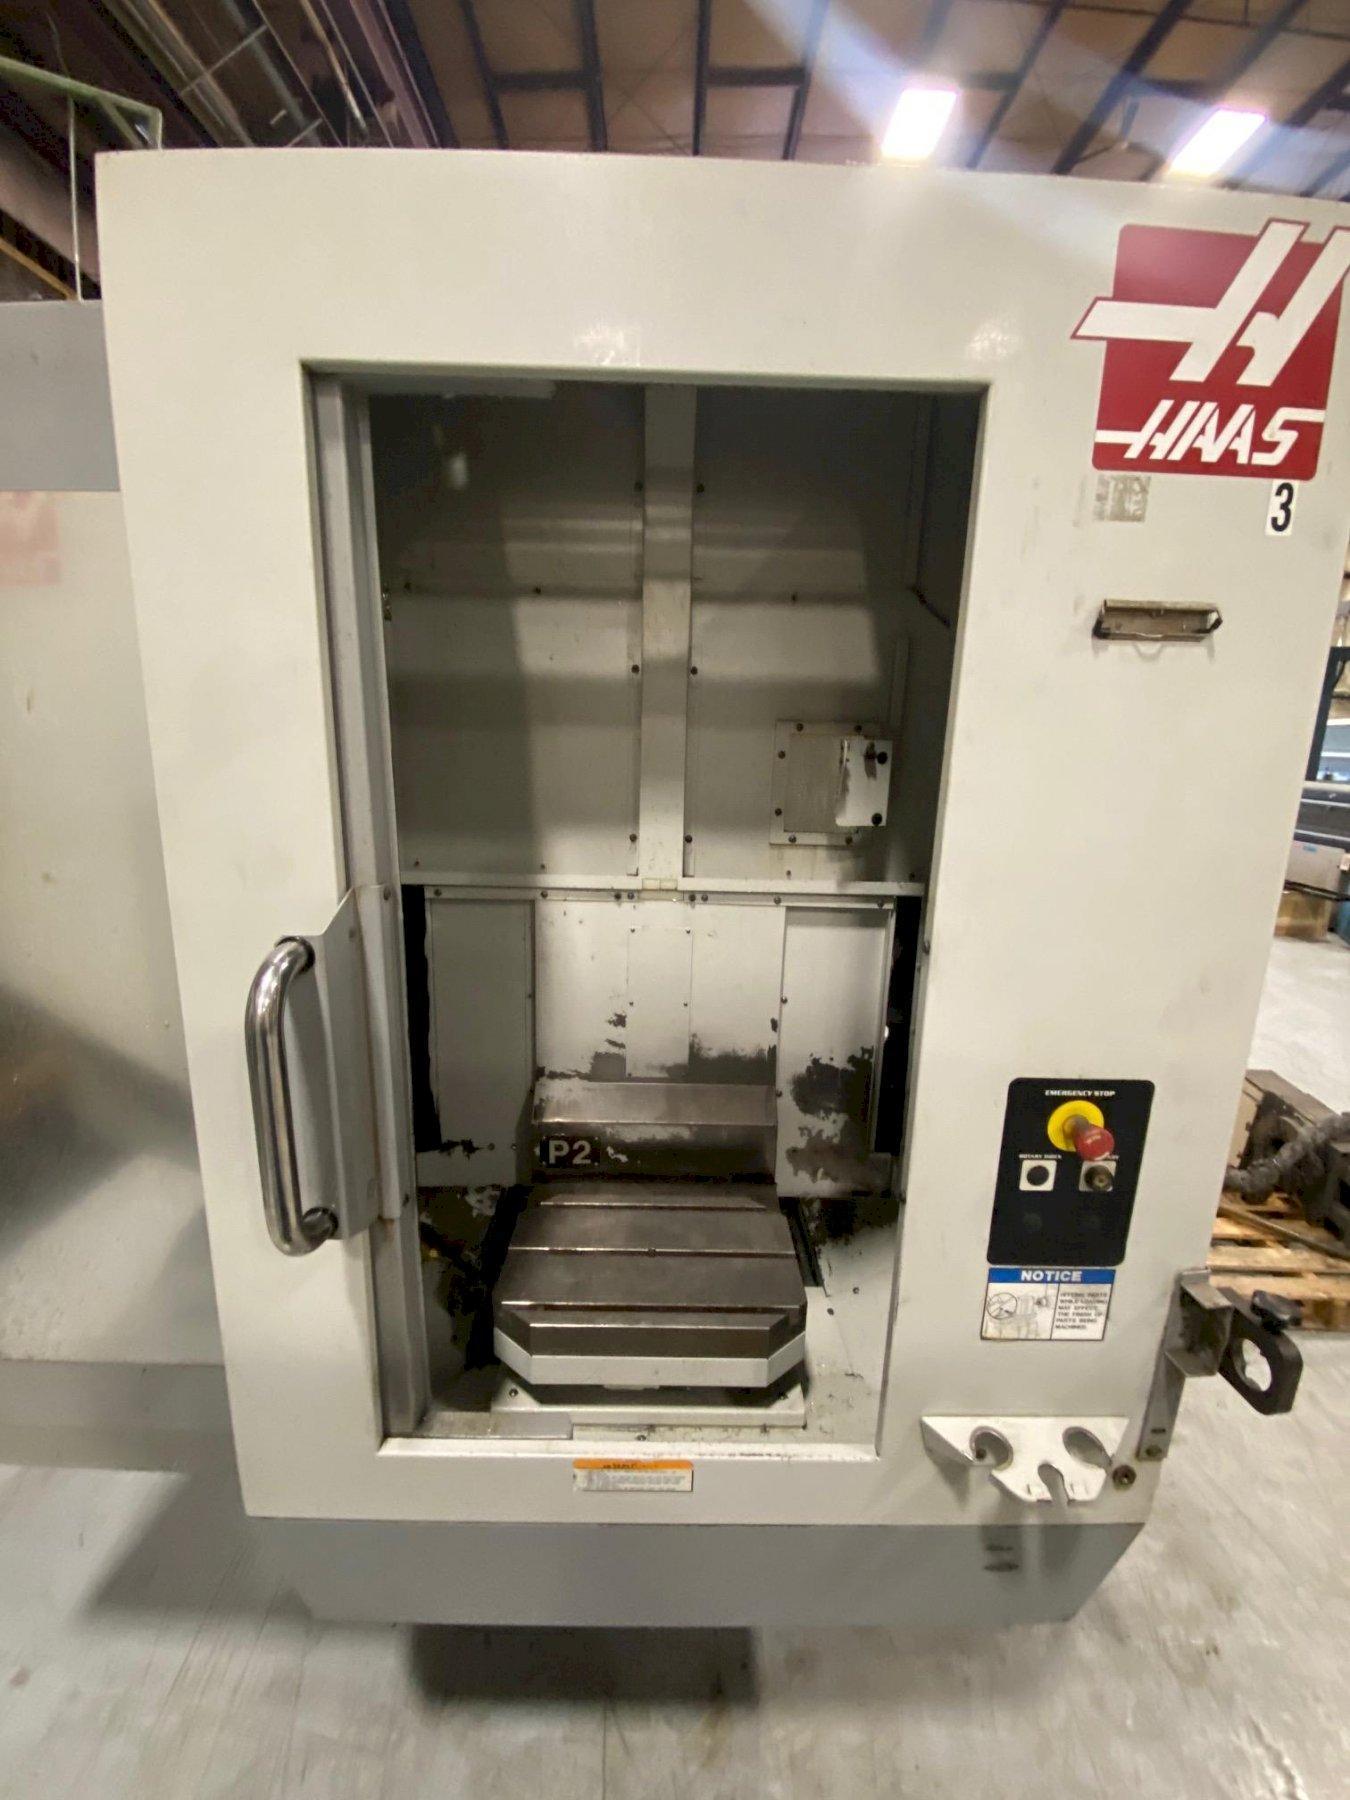 Haas MDC-500 CNC Vertical Pallet Changer